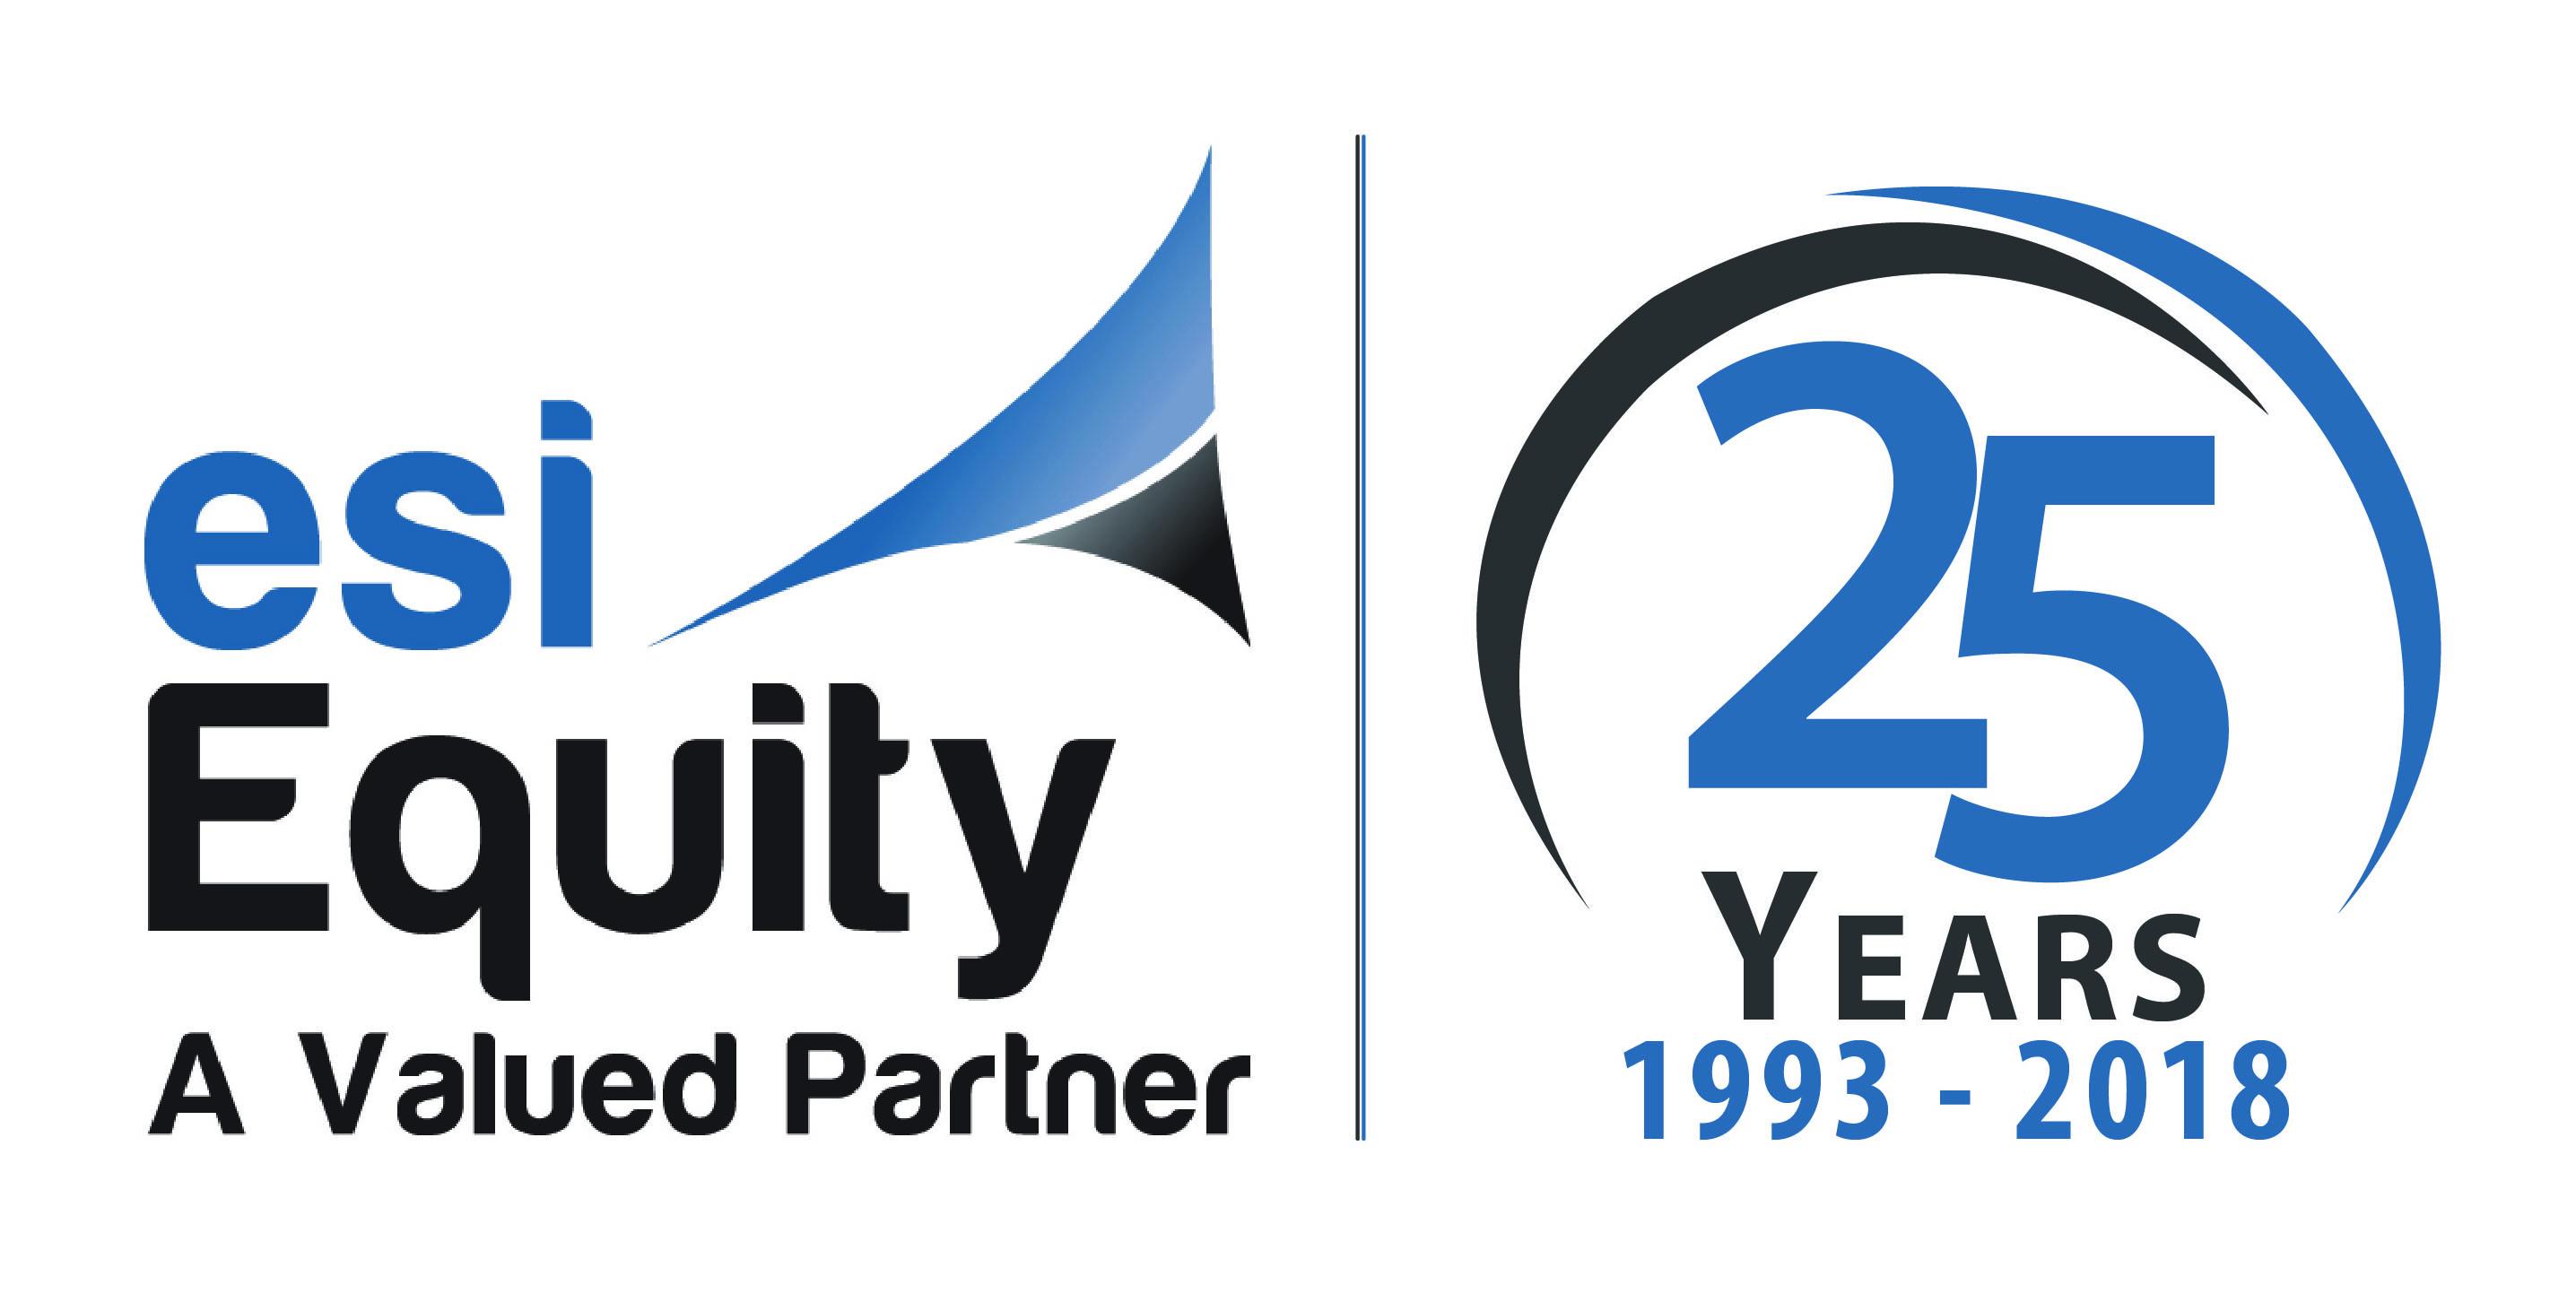 ESI Equity 25 year logo.